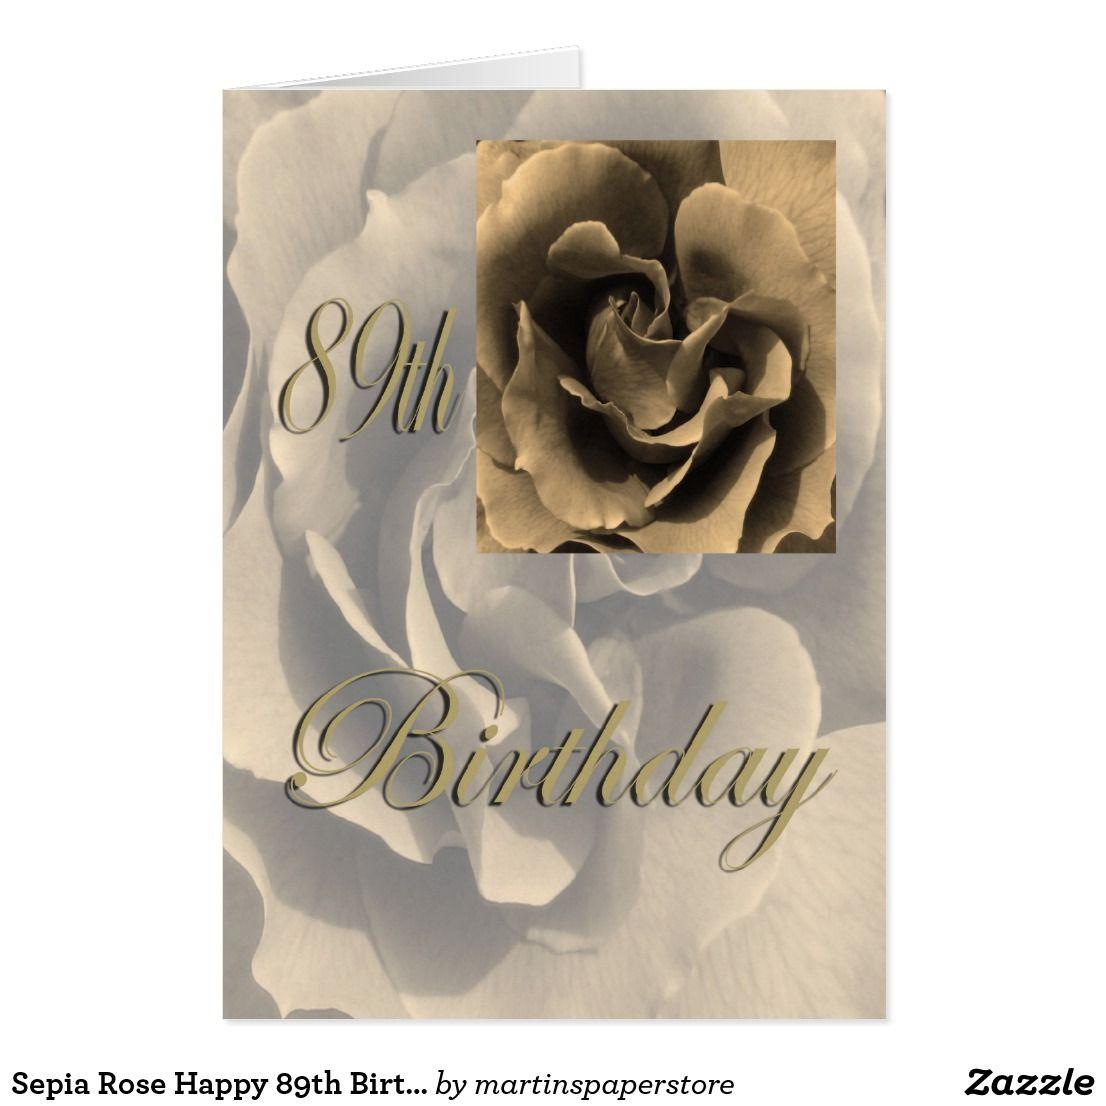 Sepia Rose Happy 89th Birthday Card All Things Zazzle Birthday